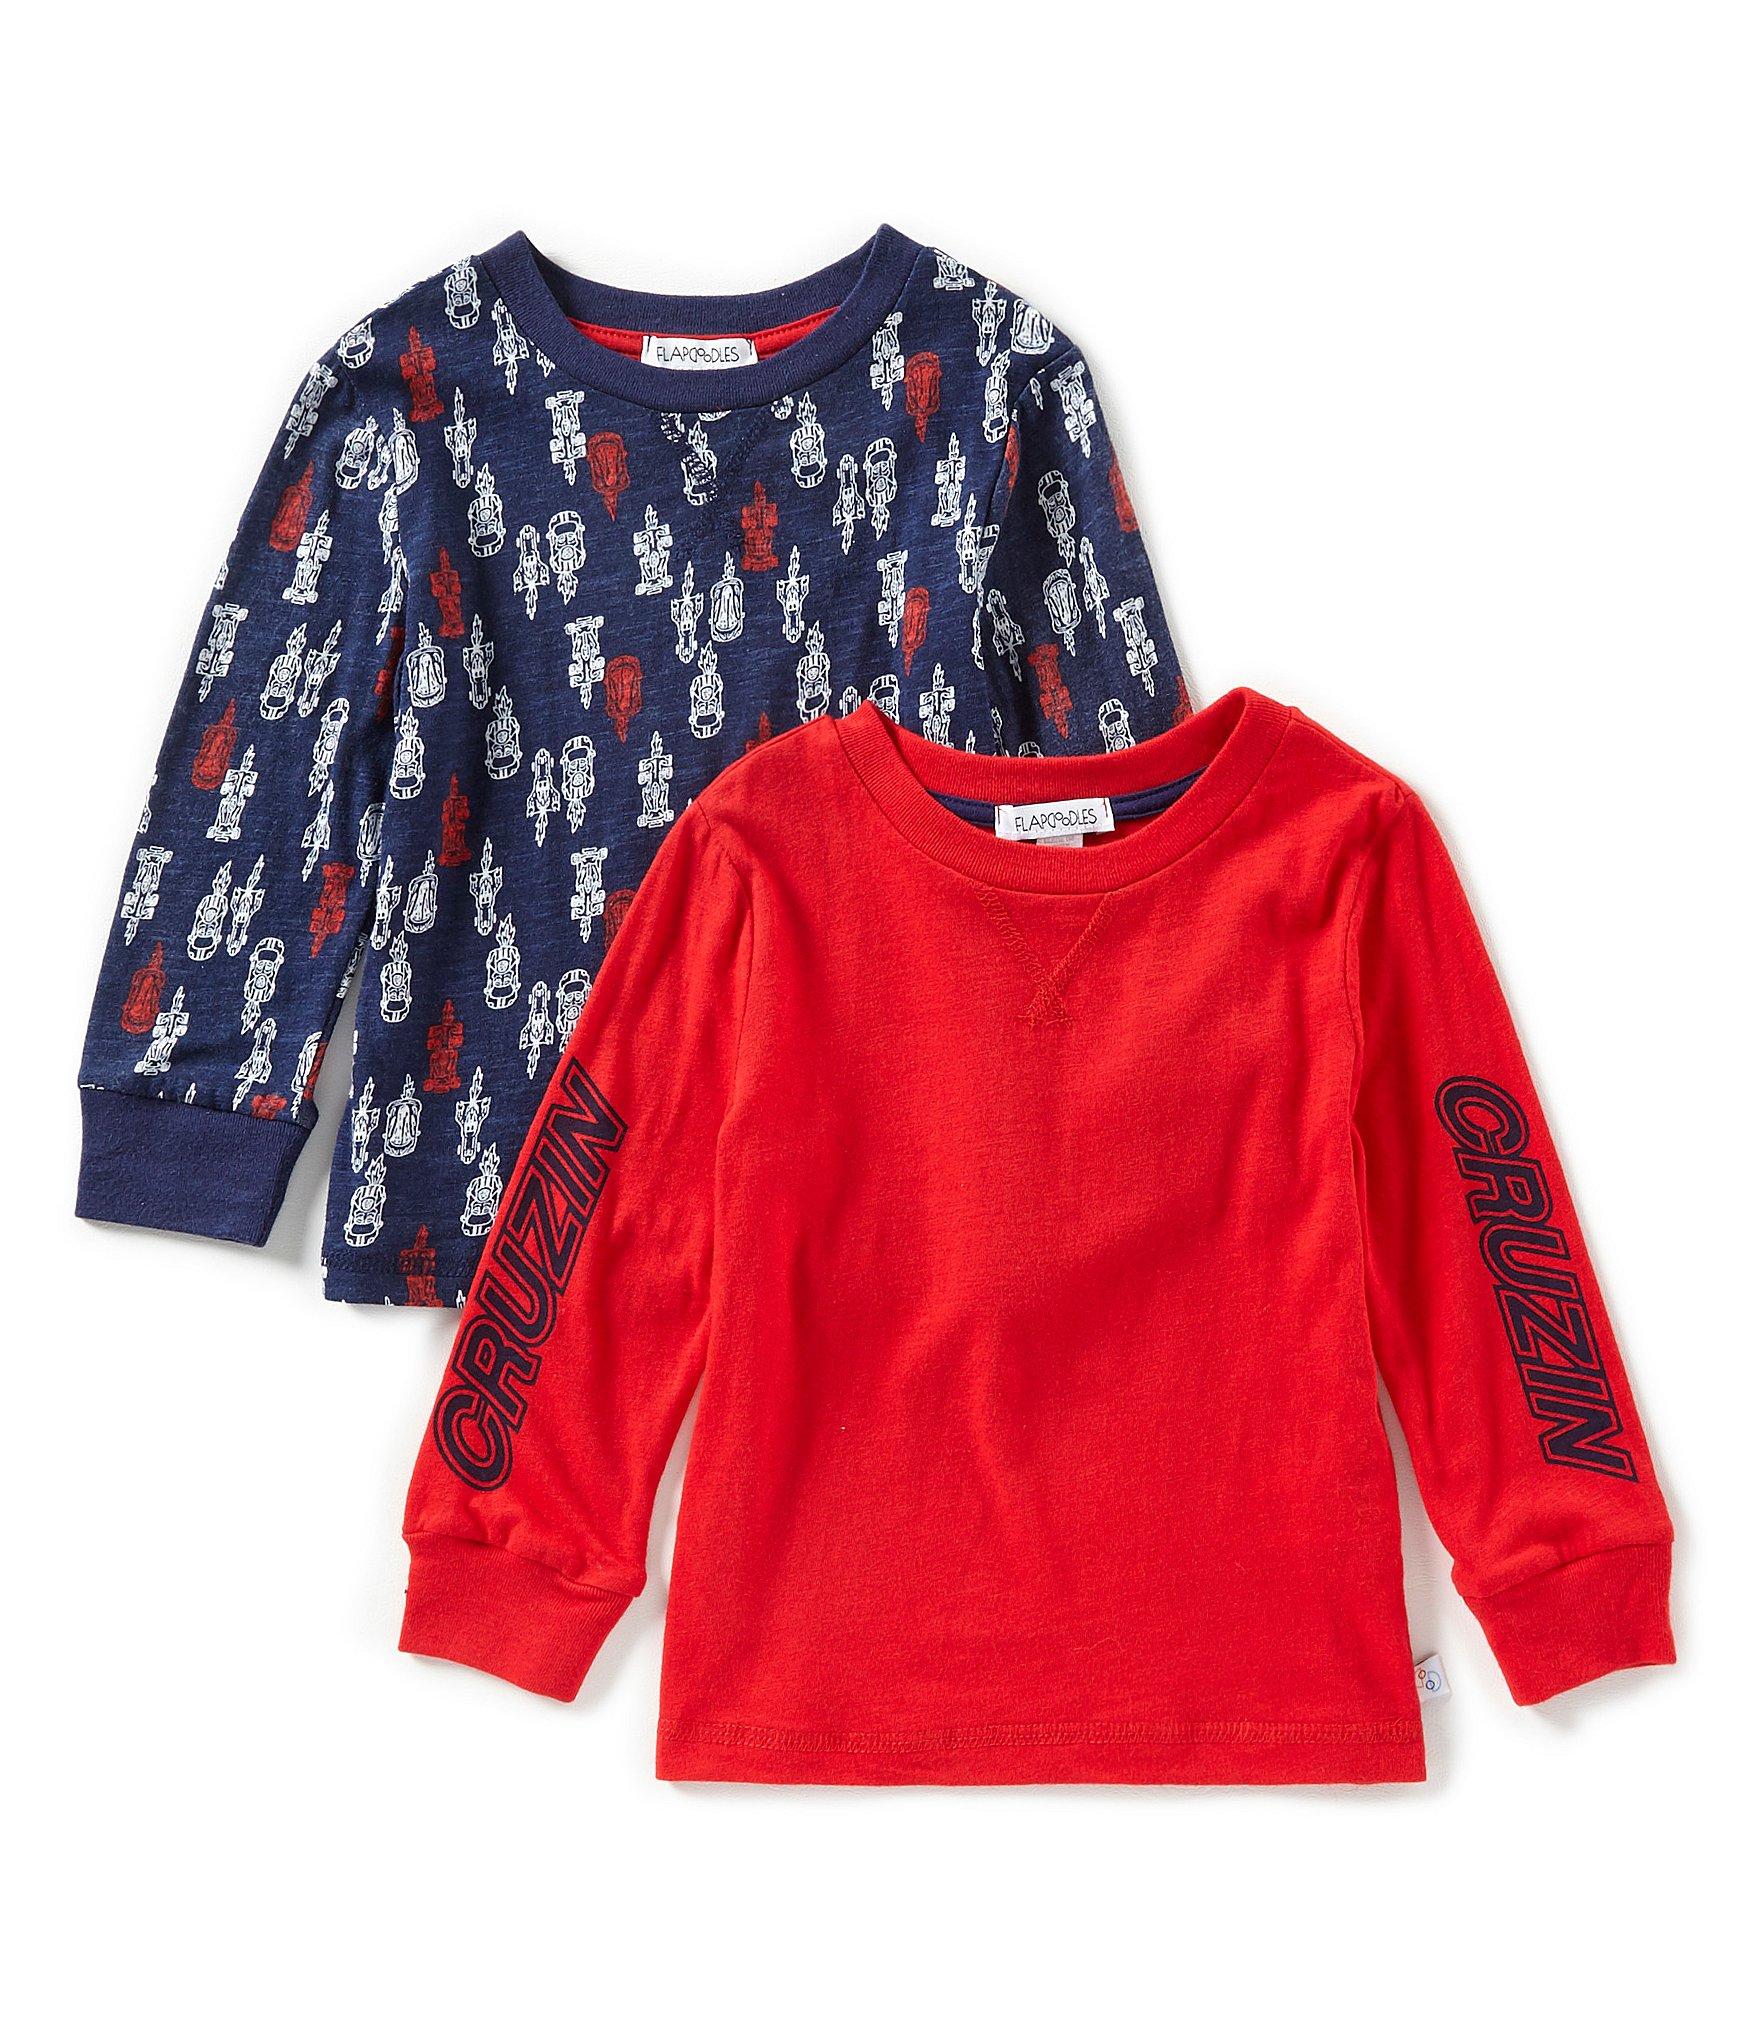 6c4426856 Baby Boys Clothing